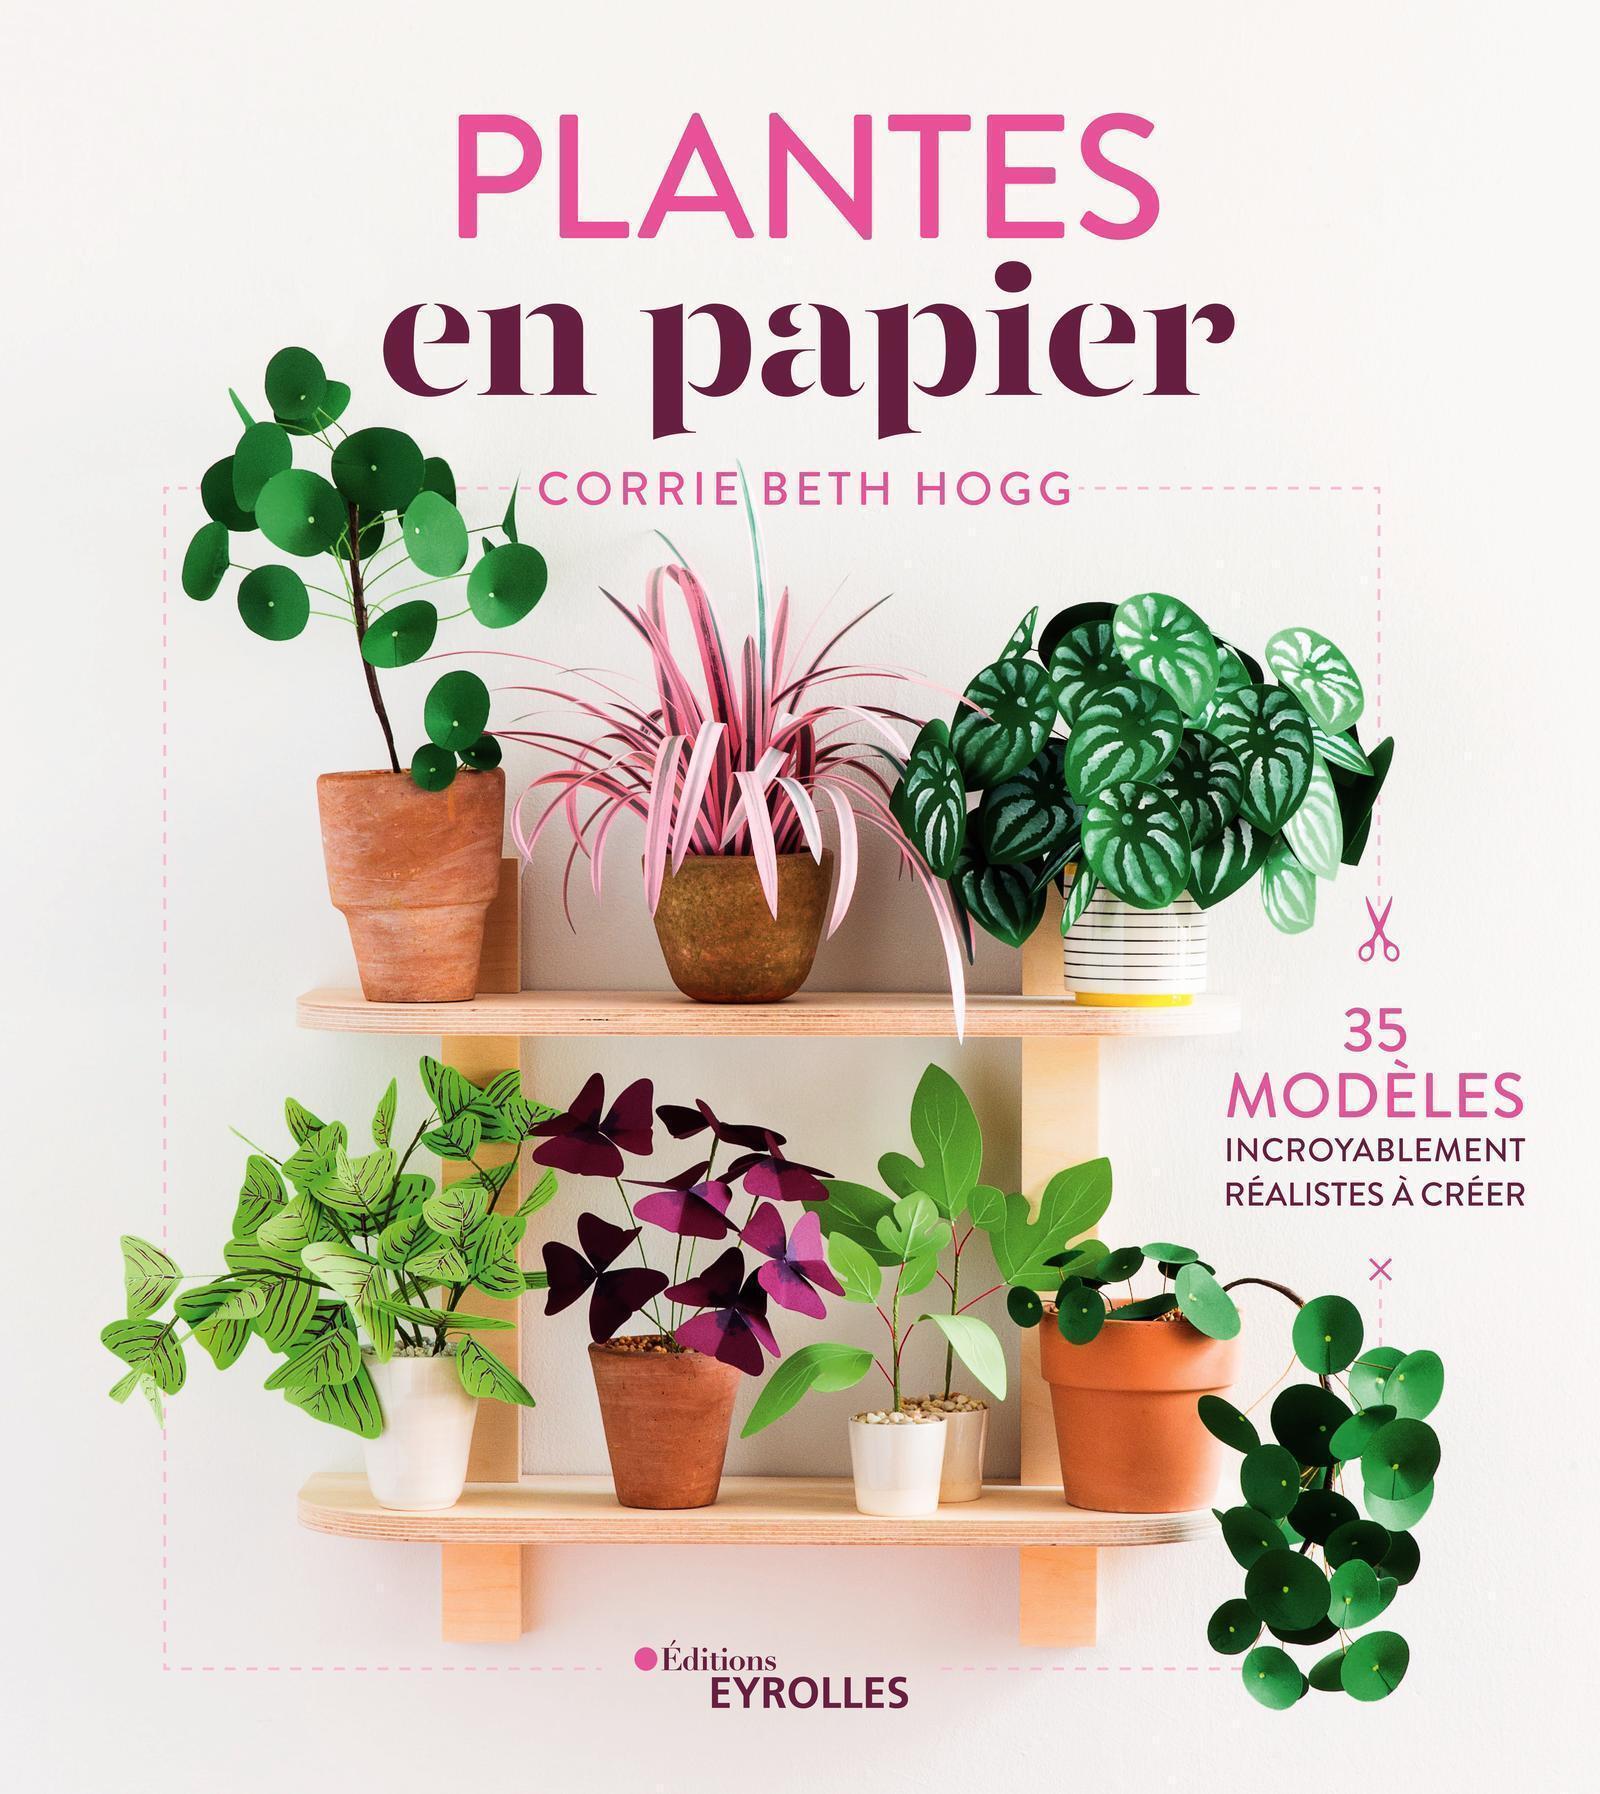 PLANTES EN PAPIER - 35 MODELES INCROYABLEMENT REALISTES A CREER